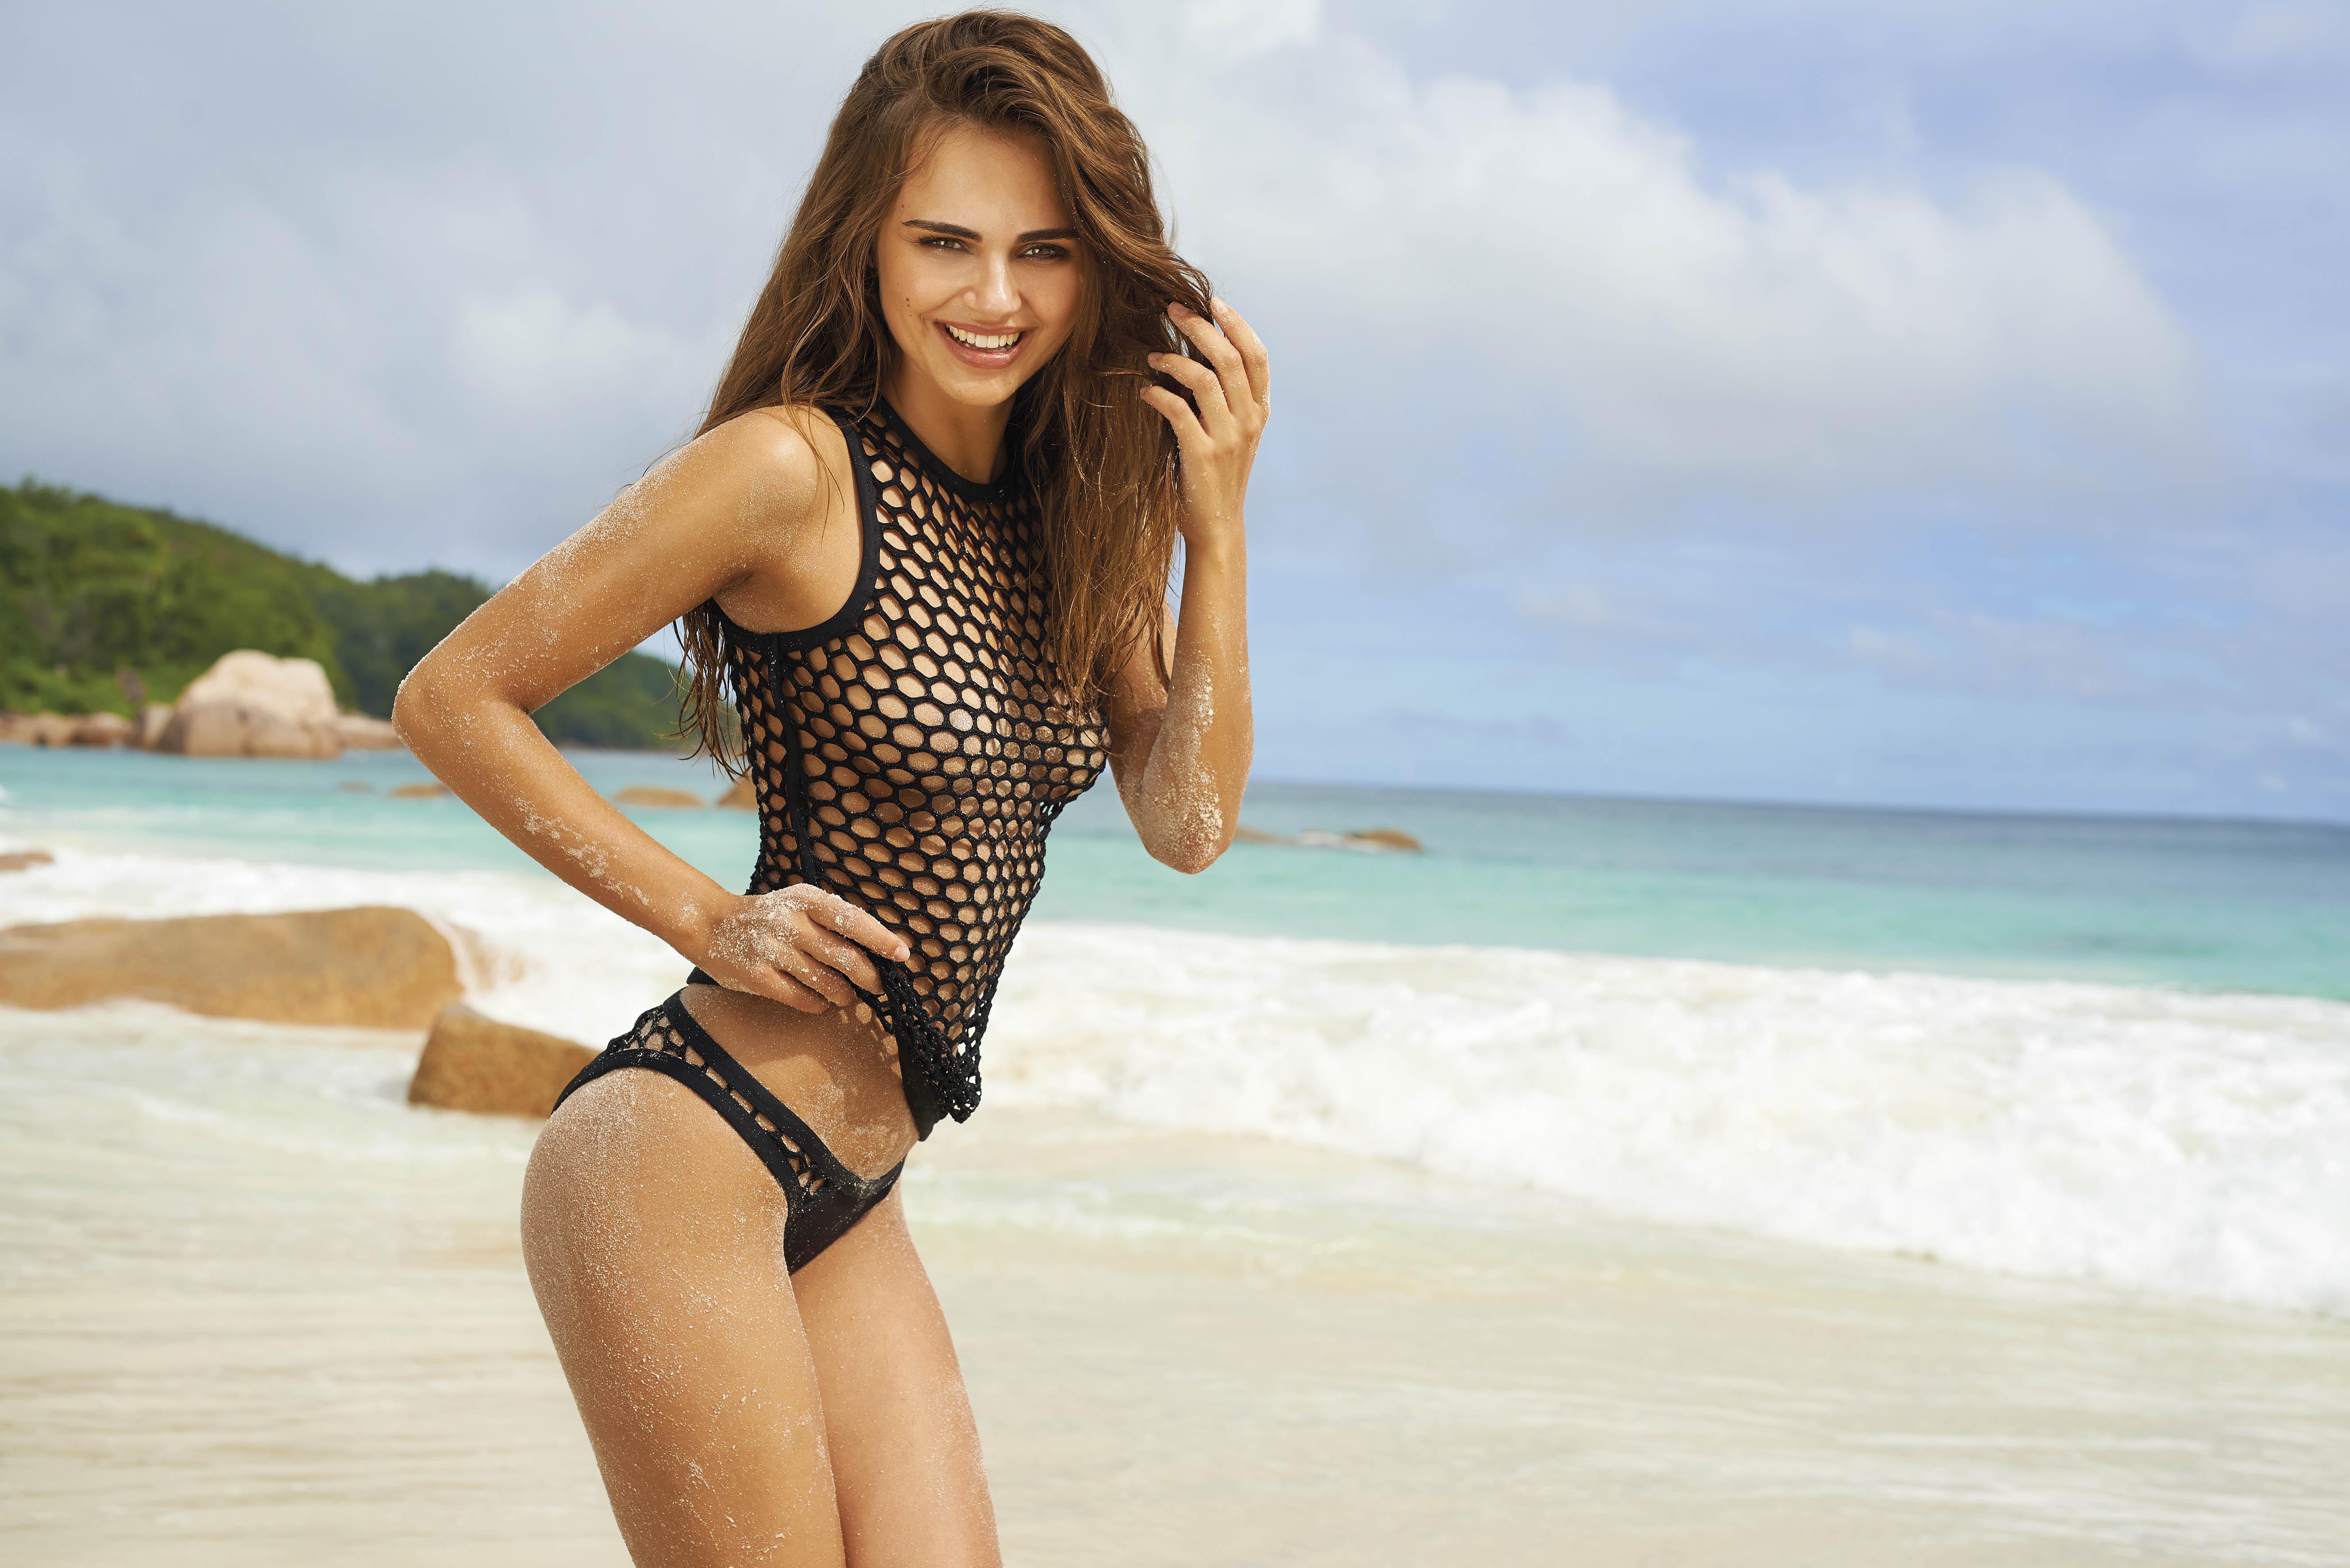 Teen Swimsuit Modeling 59